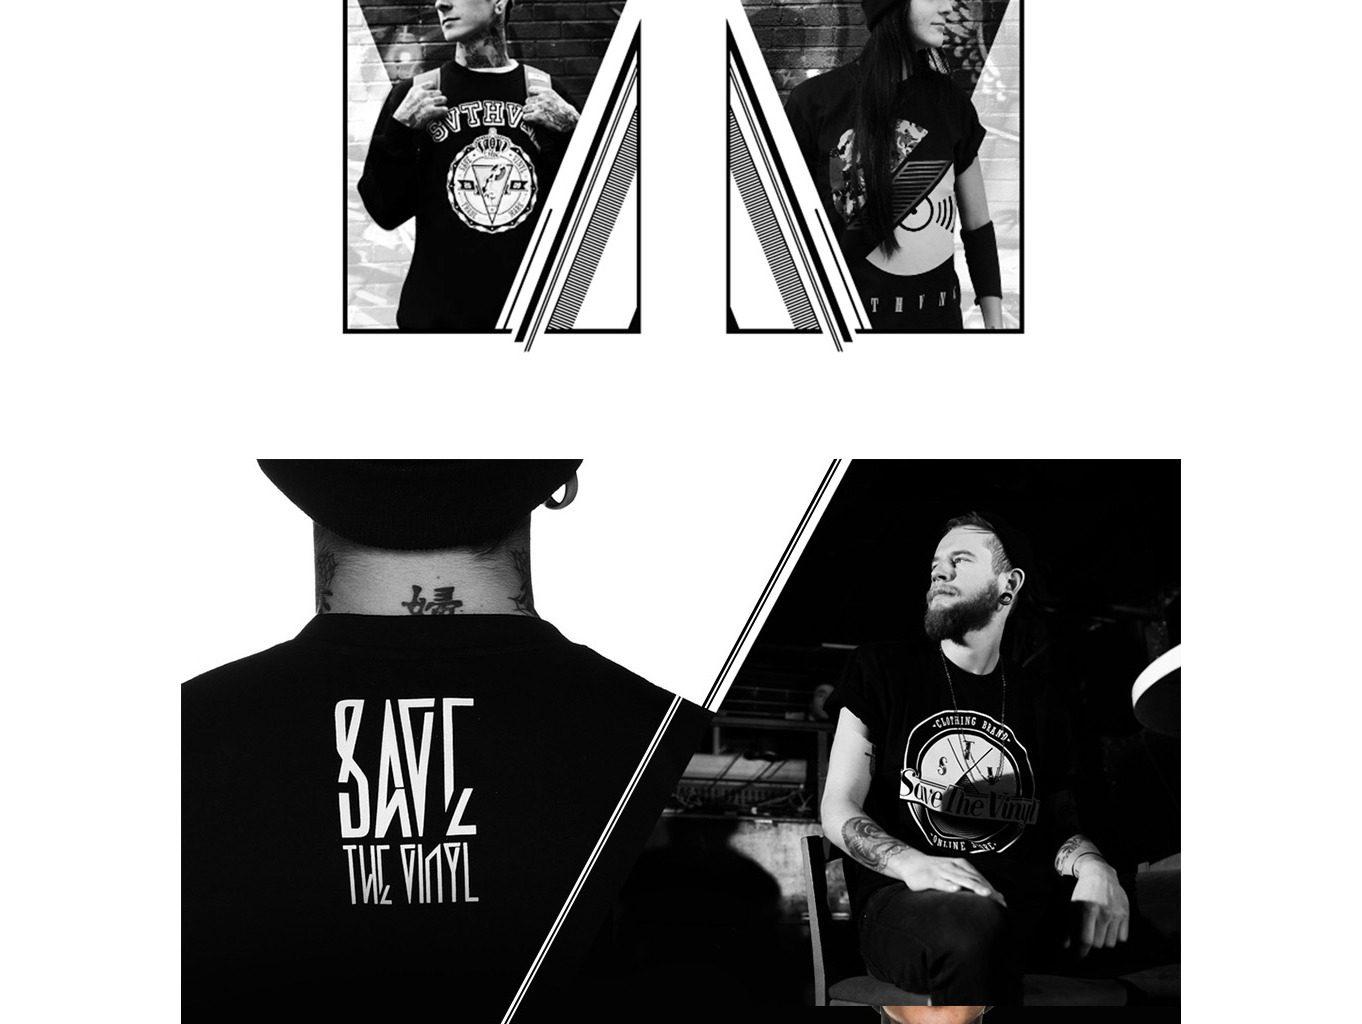 Save The Vinyl 4